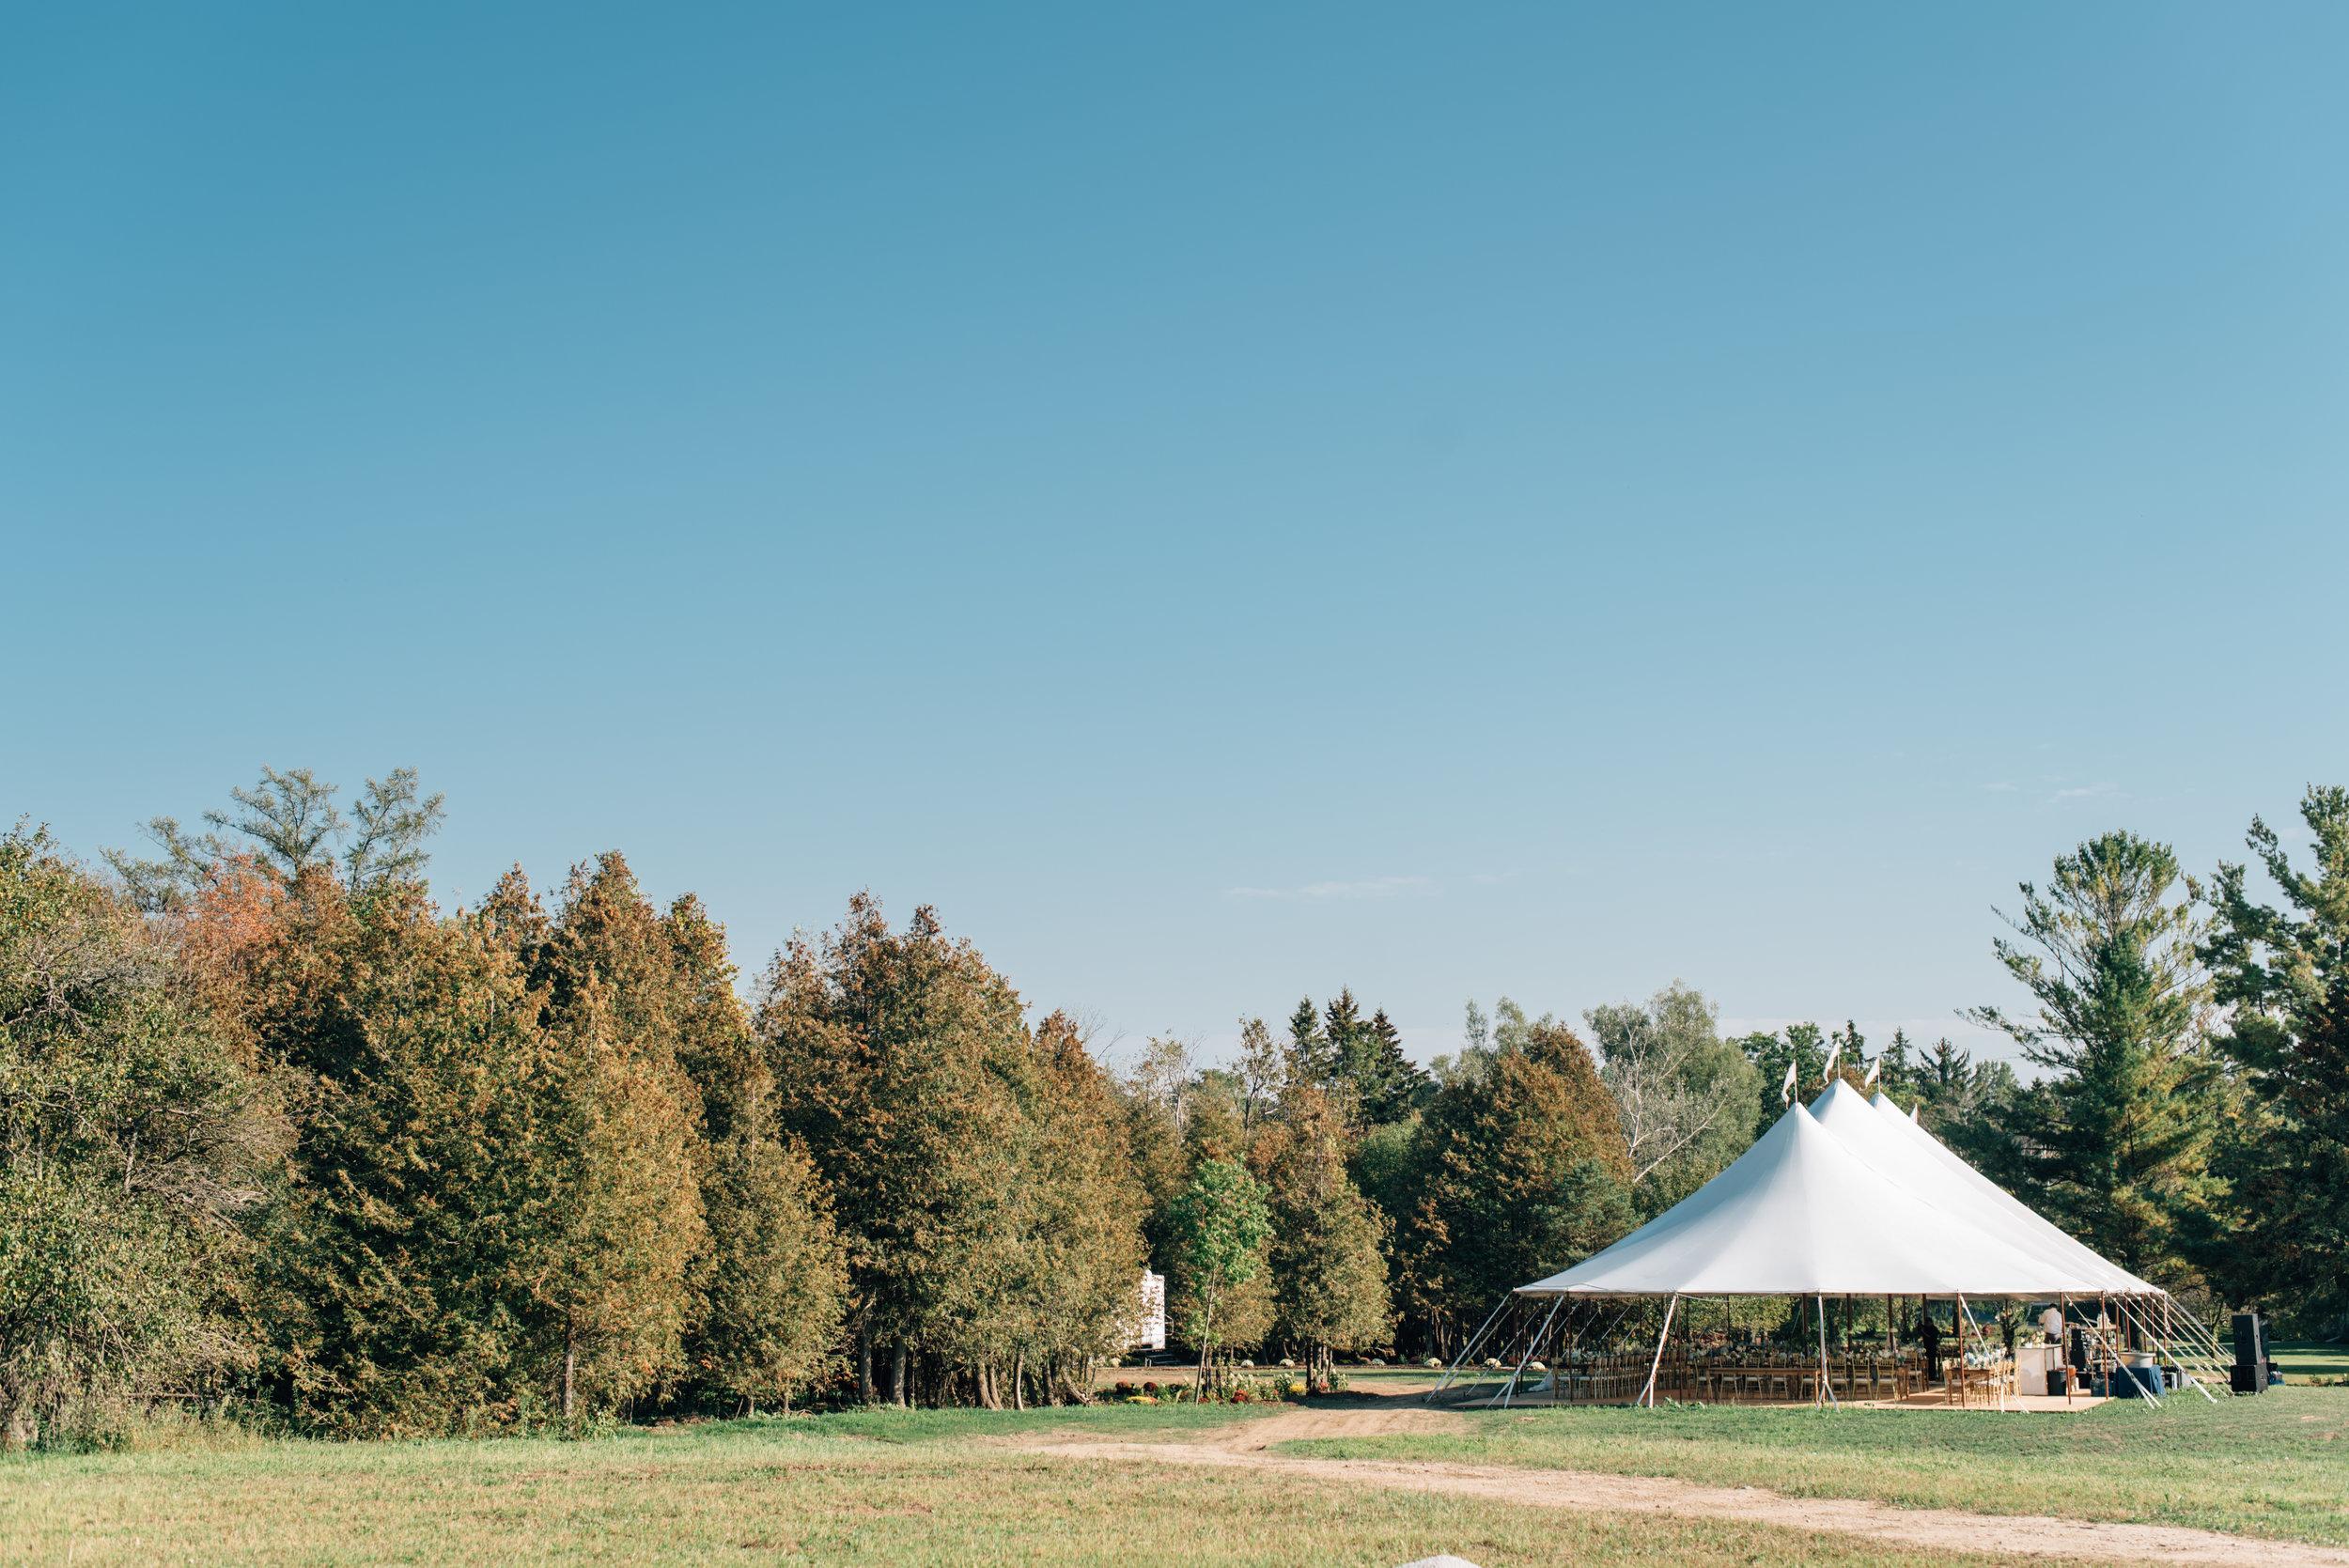 sept-23-wedding-details-lustre-events-sara-wilde-photography-0129.jpg